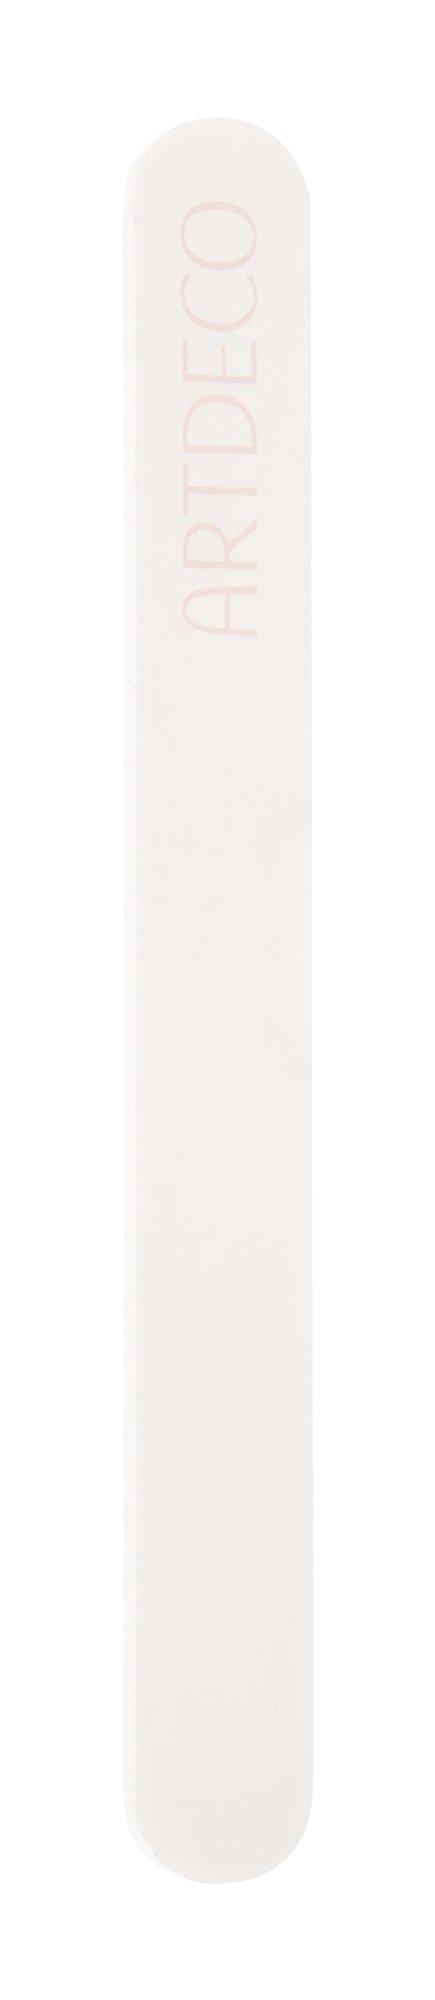 Artdeco Nail Care Nail File 1ml